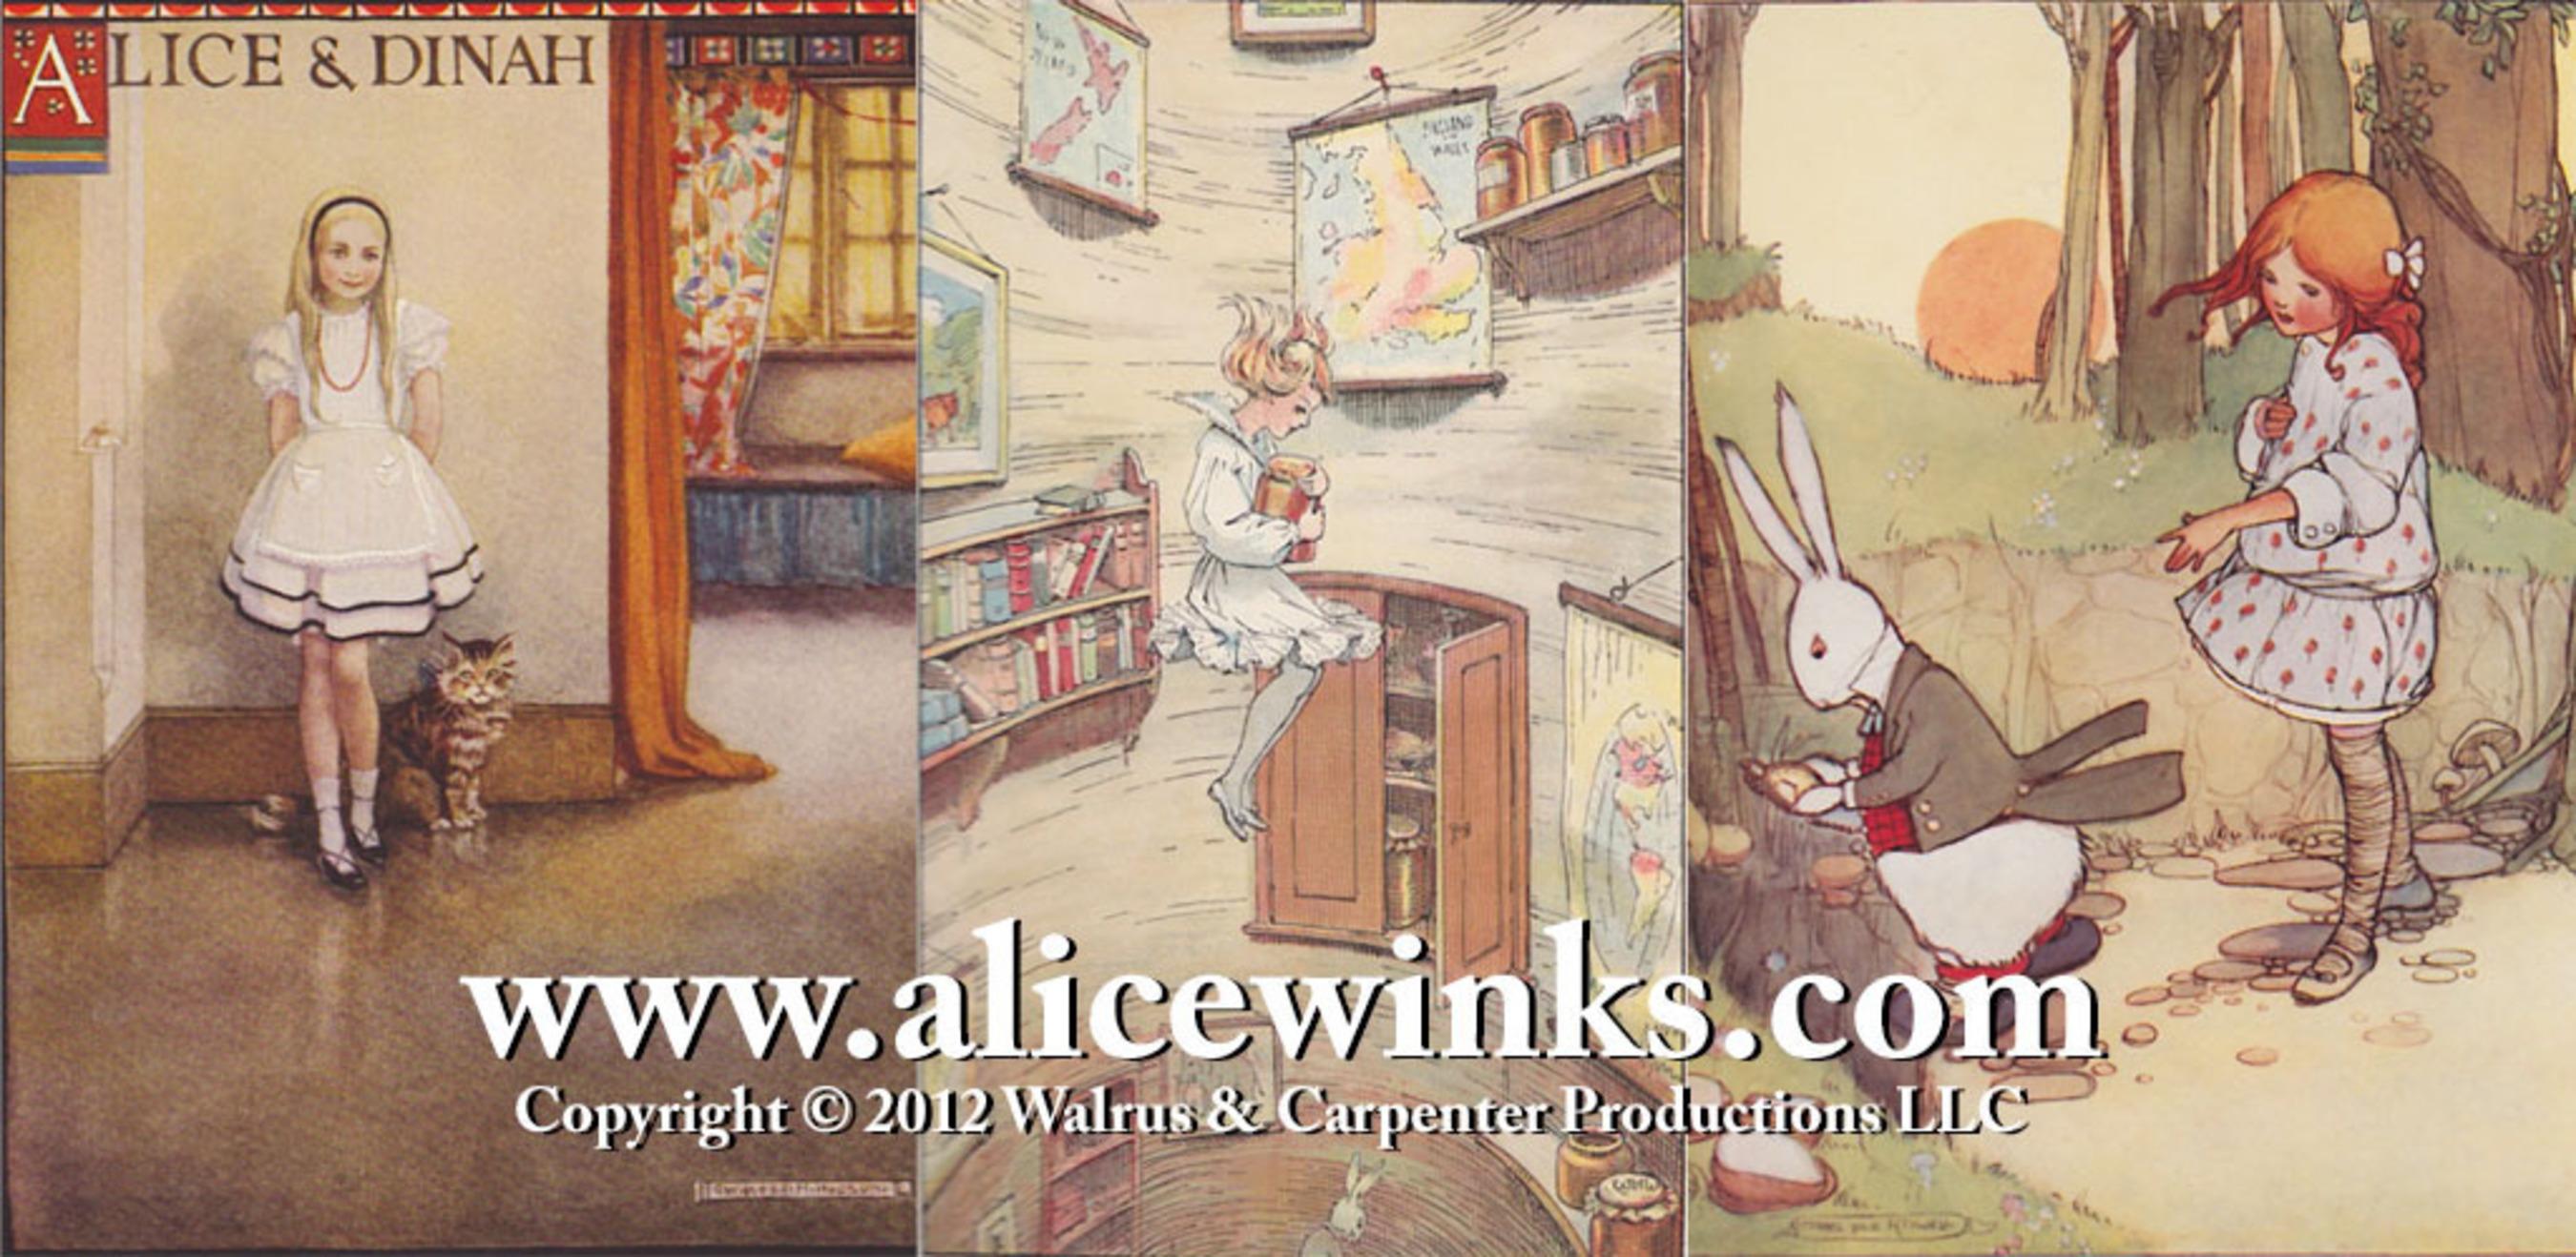 Alicewinks image #2.  (PRNewsFoto/Walrus & Carpenter Productions LLC)